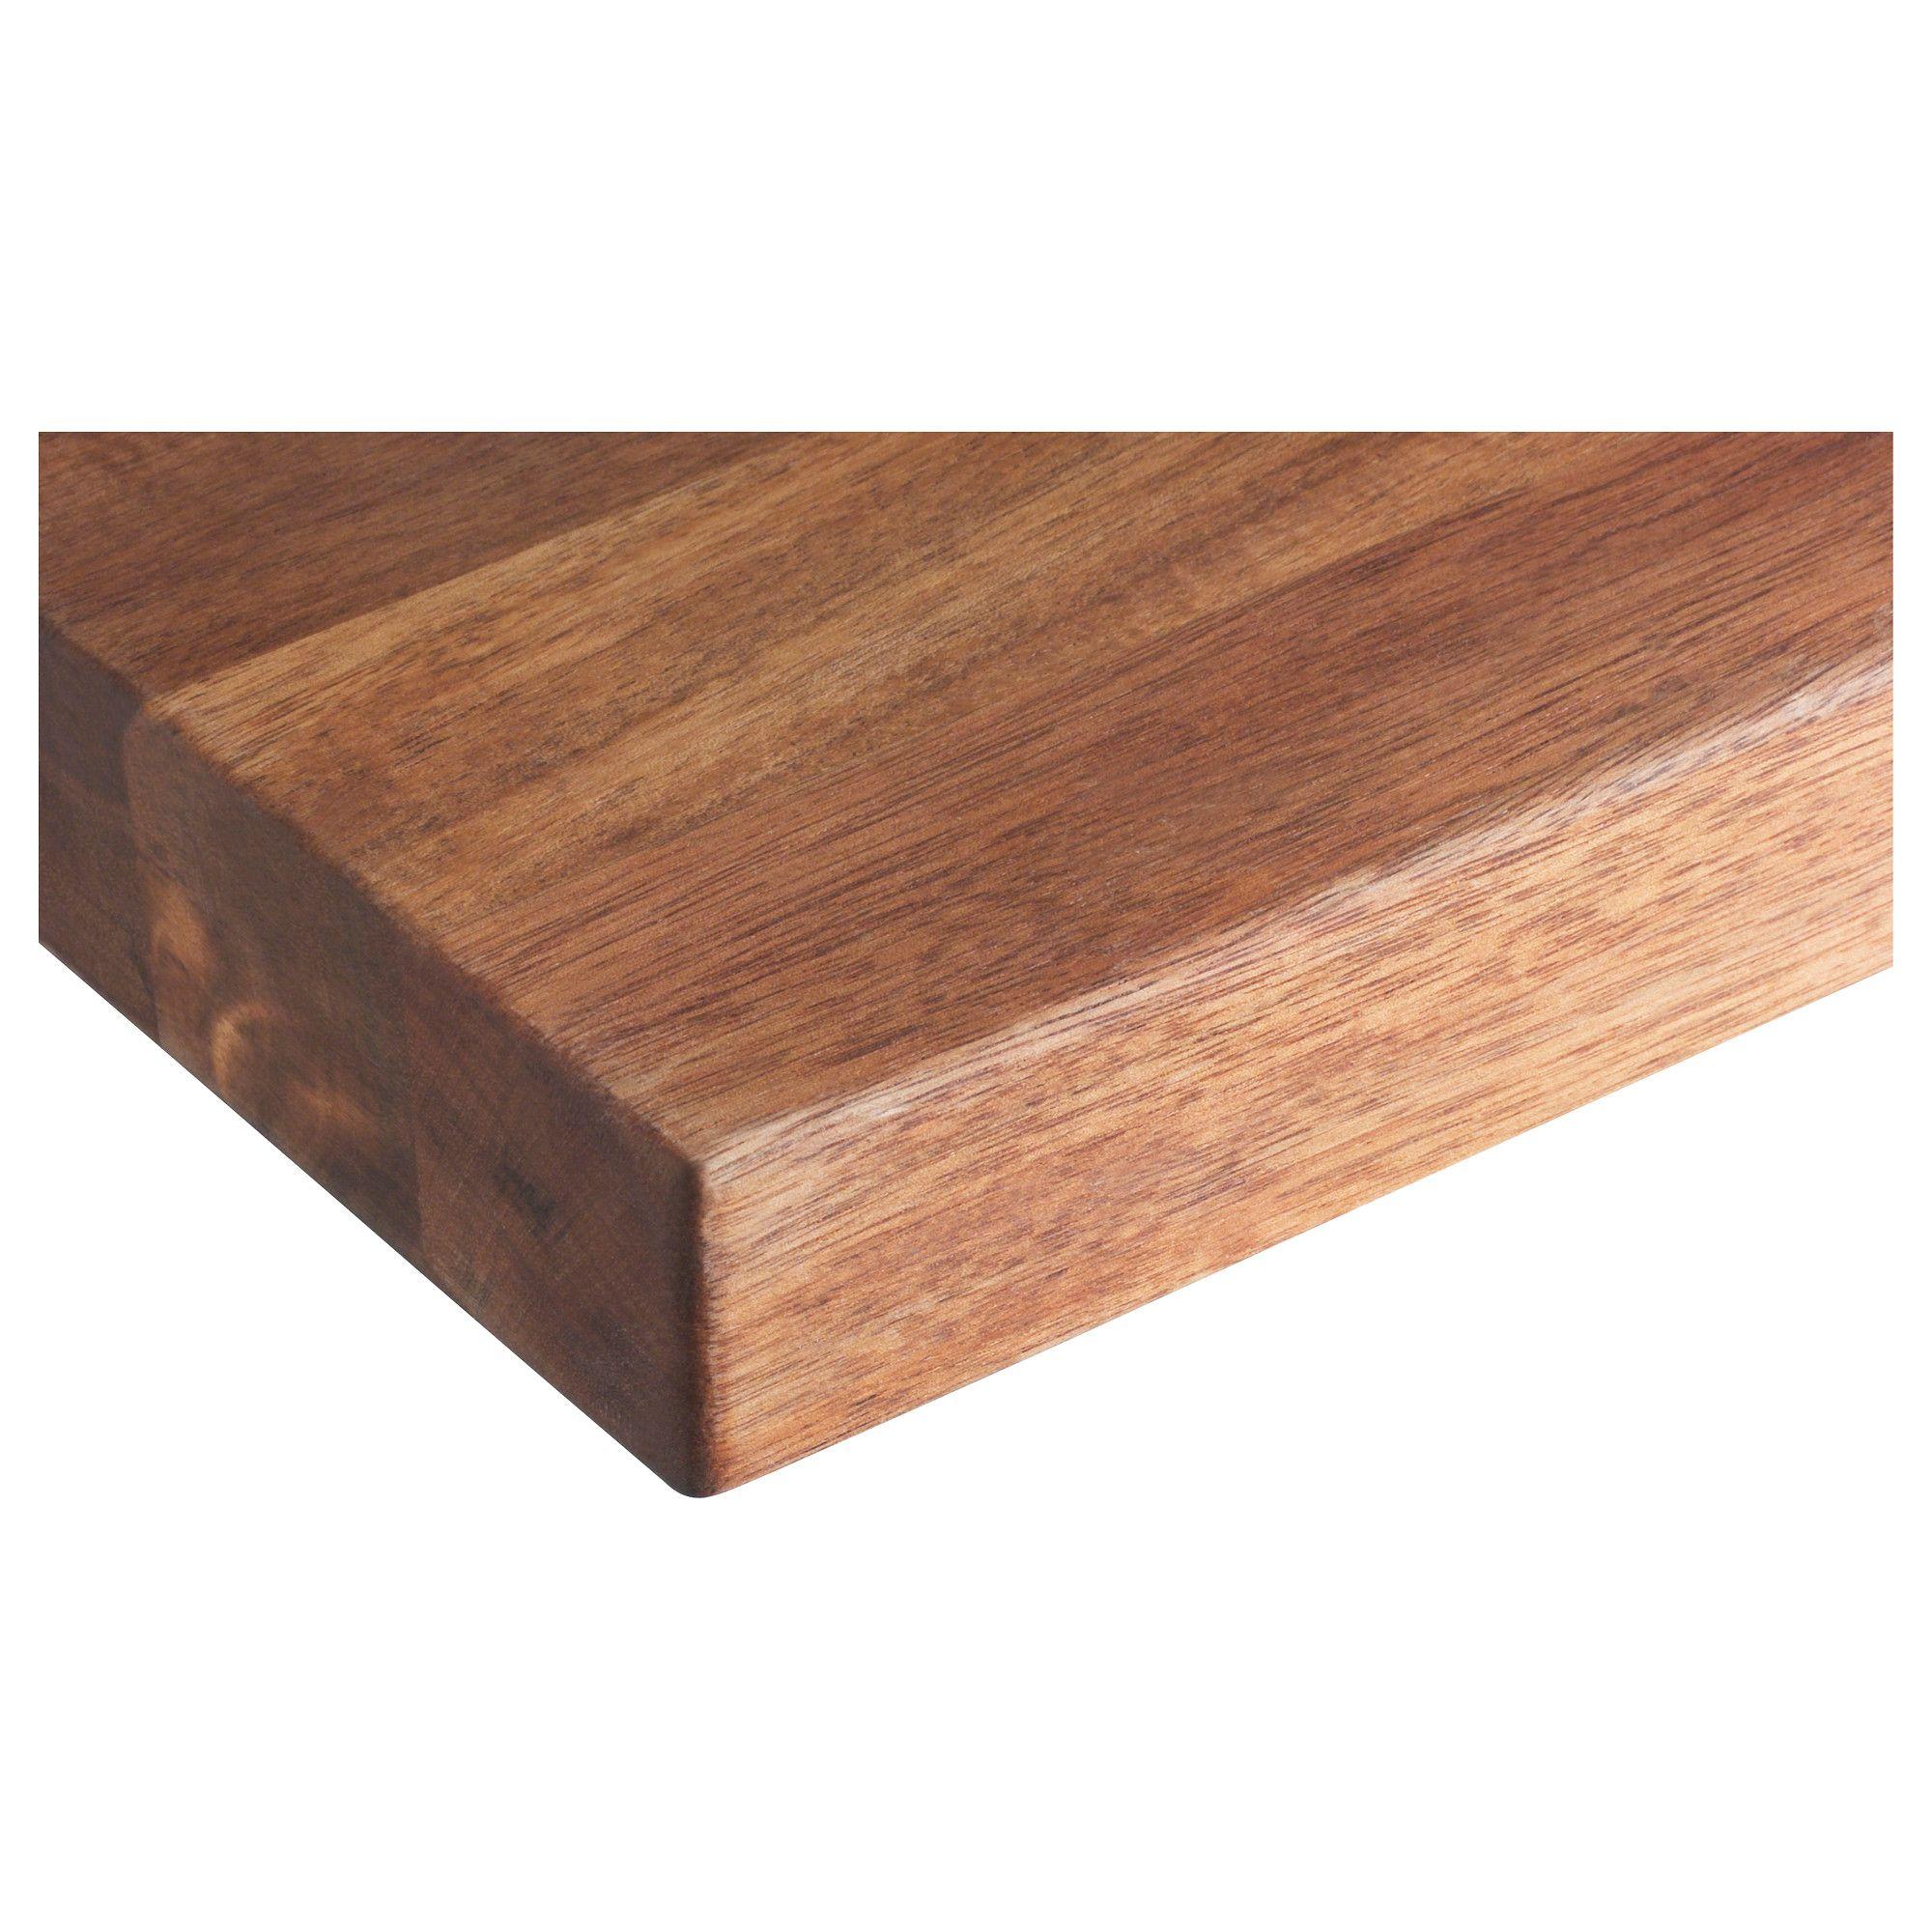 Ikea kuchenarbeitsplatten vollholz for Kuchenarbeitsplatte vollholz